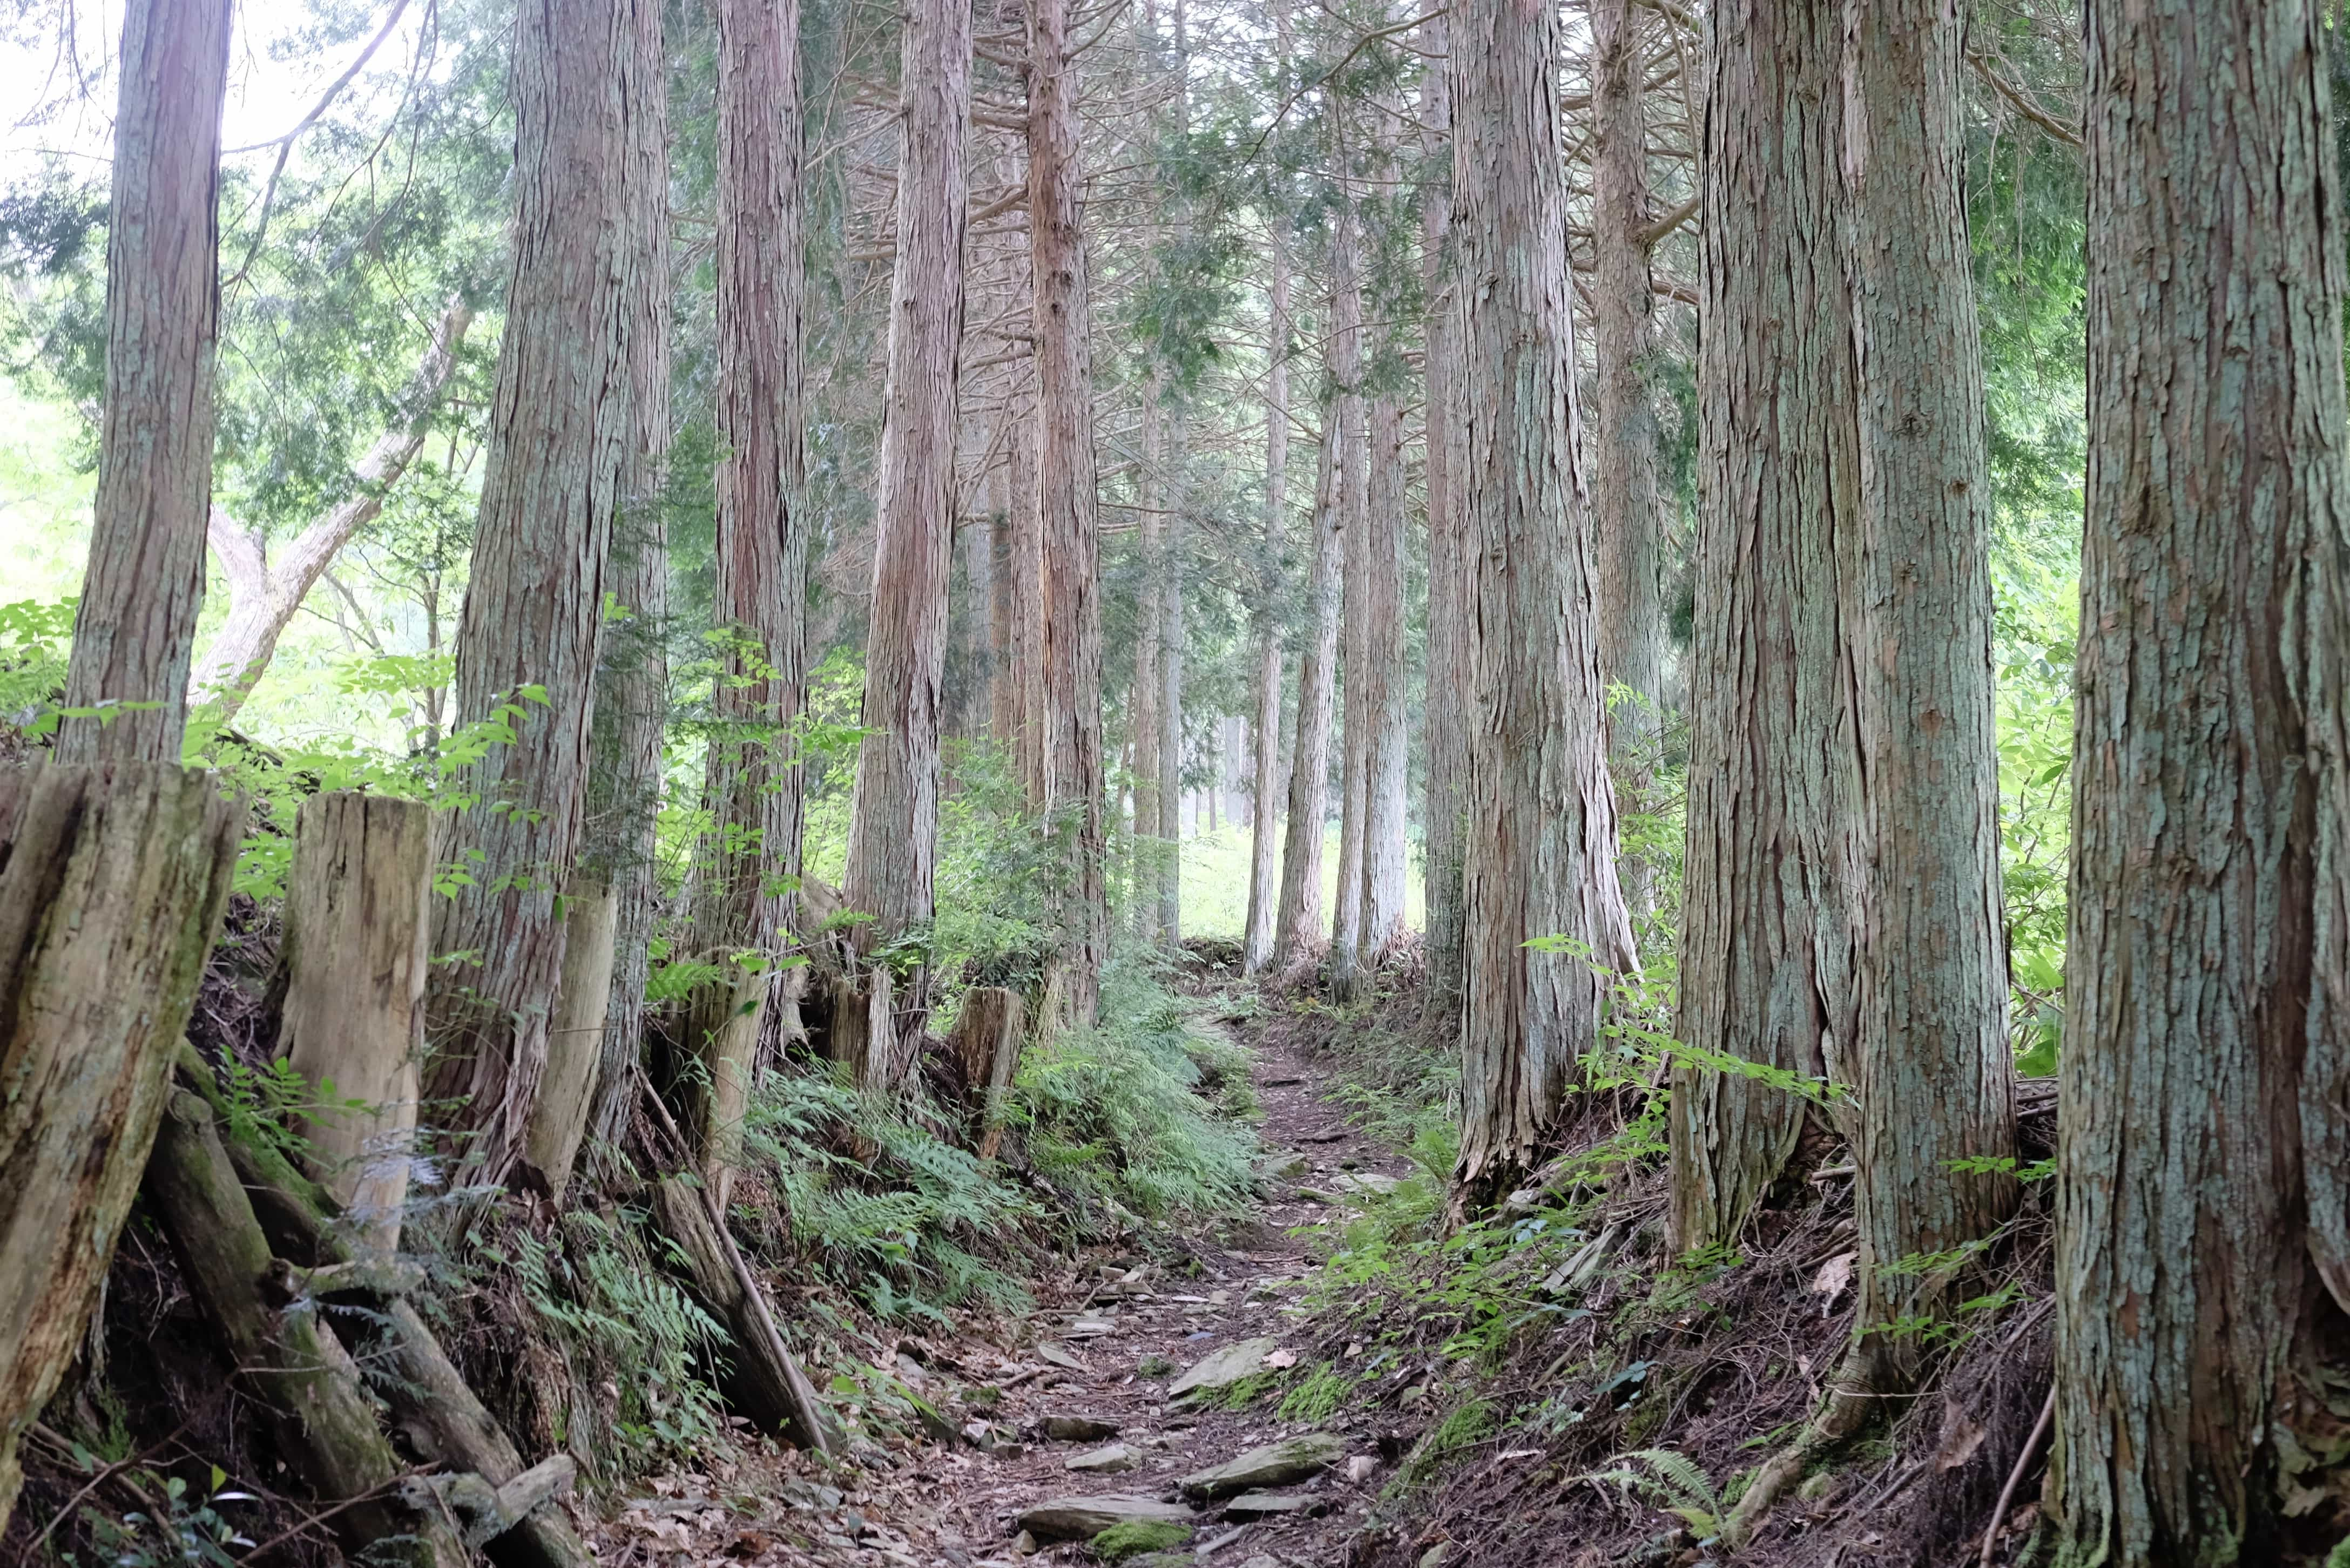 Hiwata-tō Pass